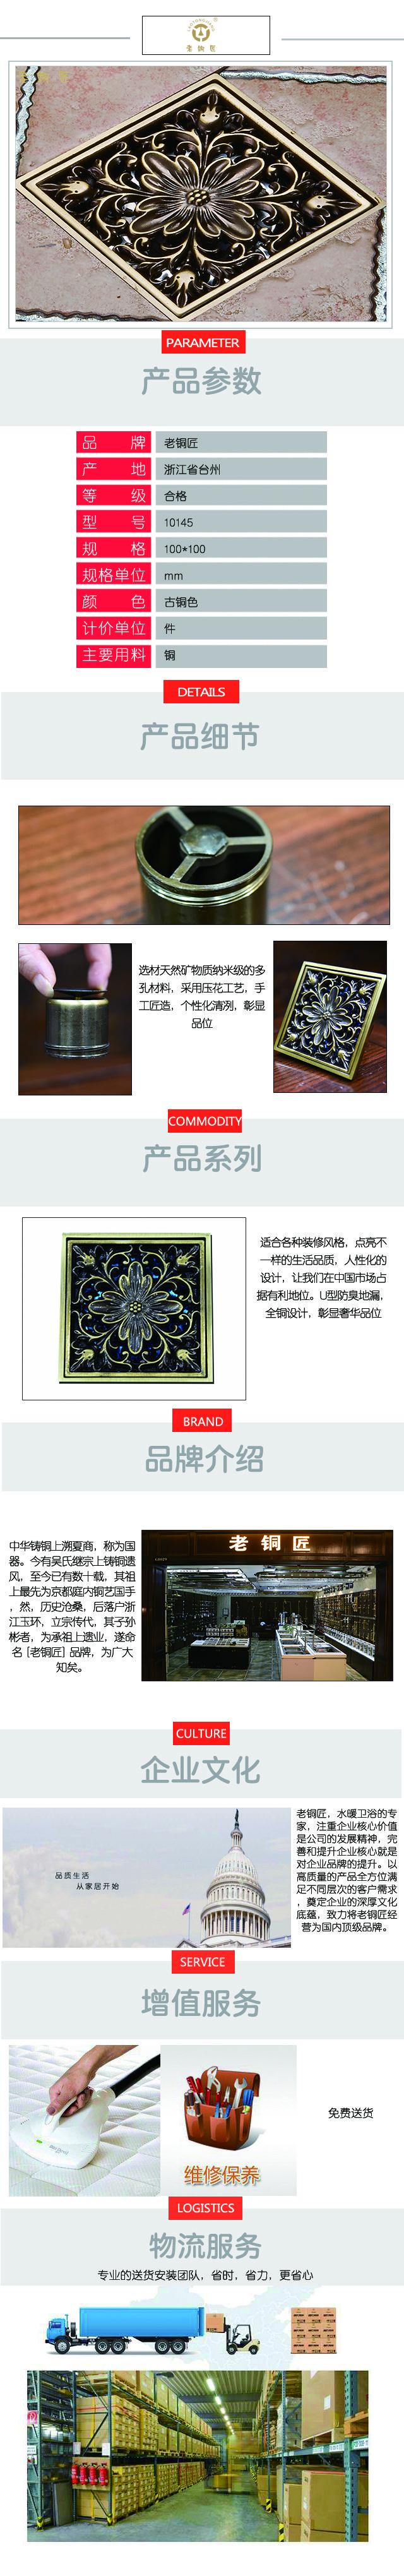 3X上海-金山-B1楼-老铜匠-地漏-10145-商品详情页